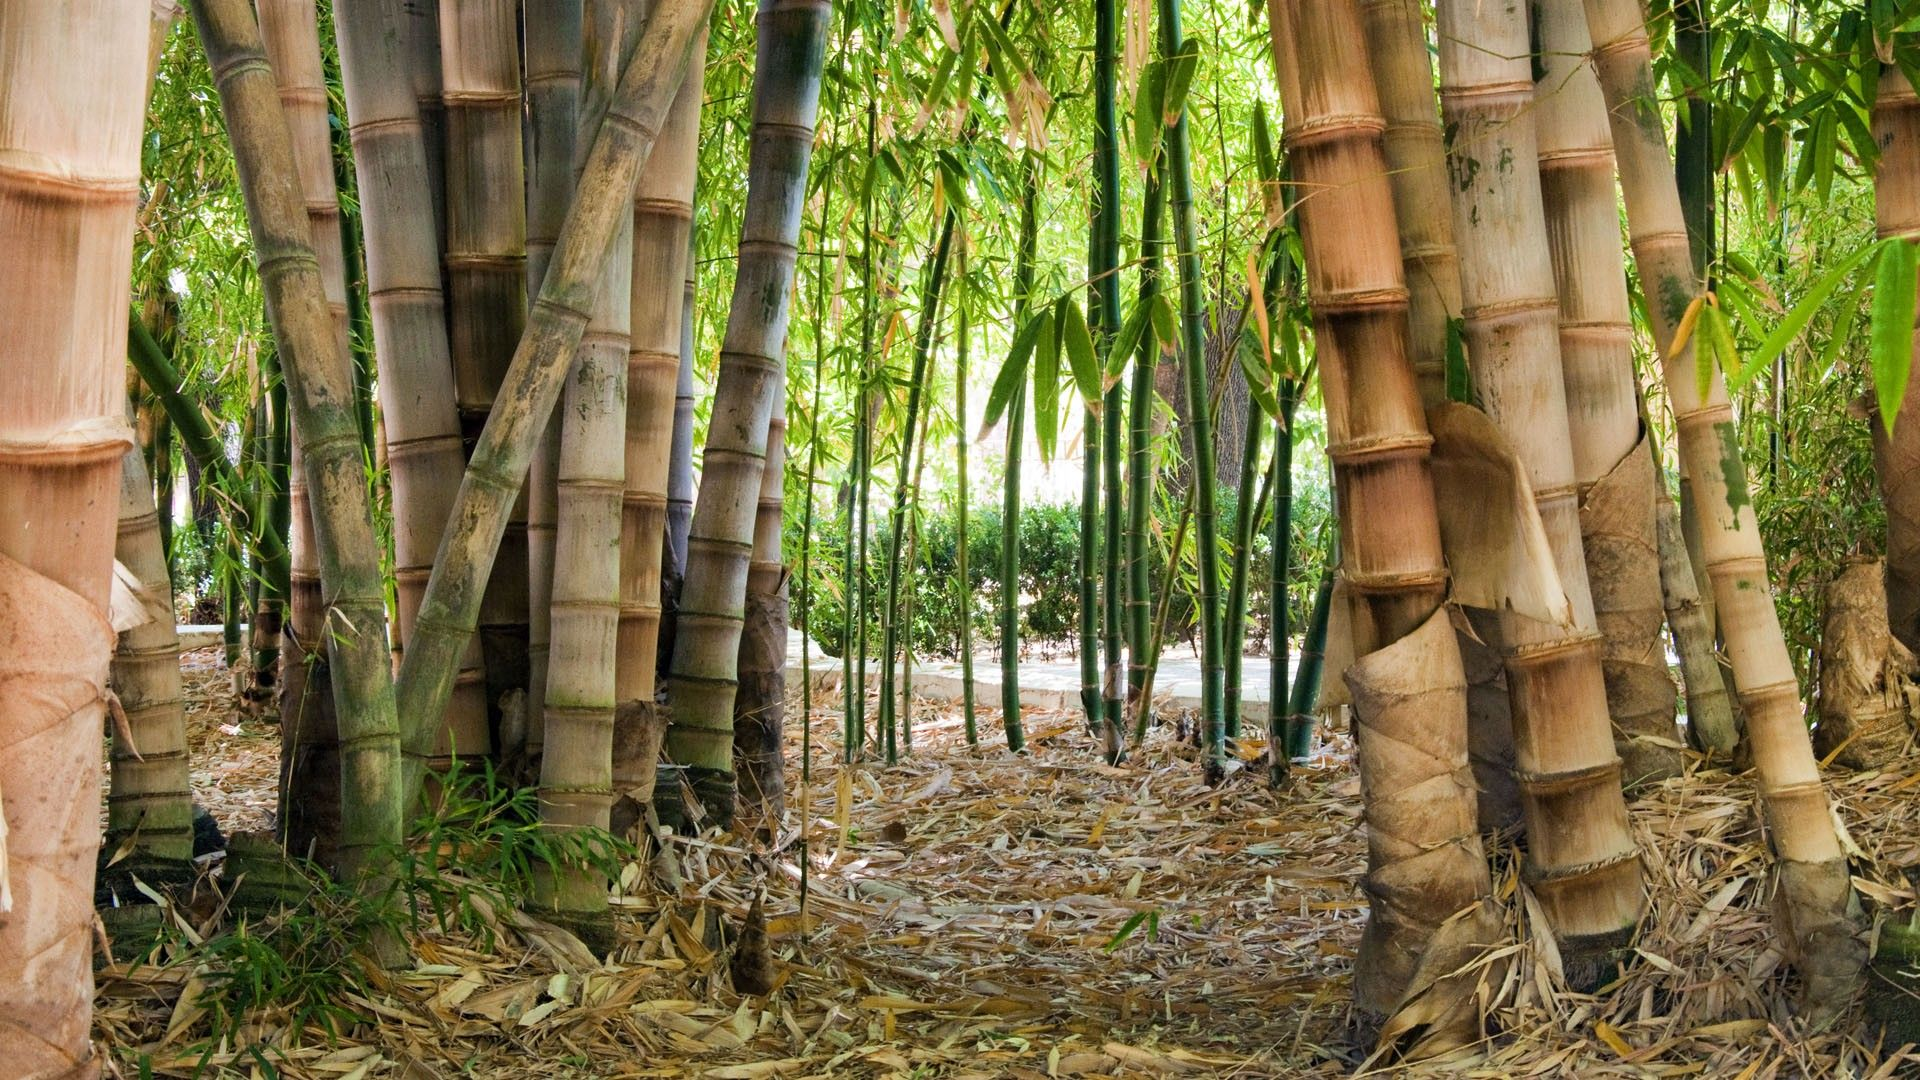 Wallpaper 3d 1080p Free Download For Mobile Bamboo Forest Hd Wallpaper Pixelstalk Net